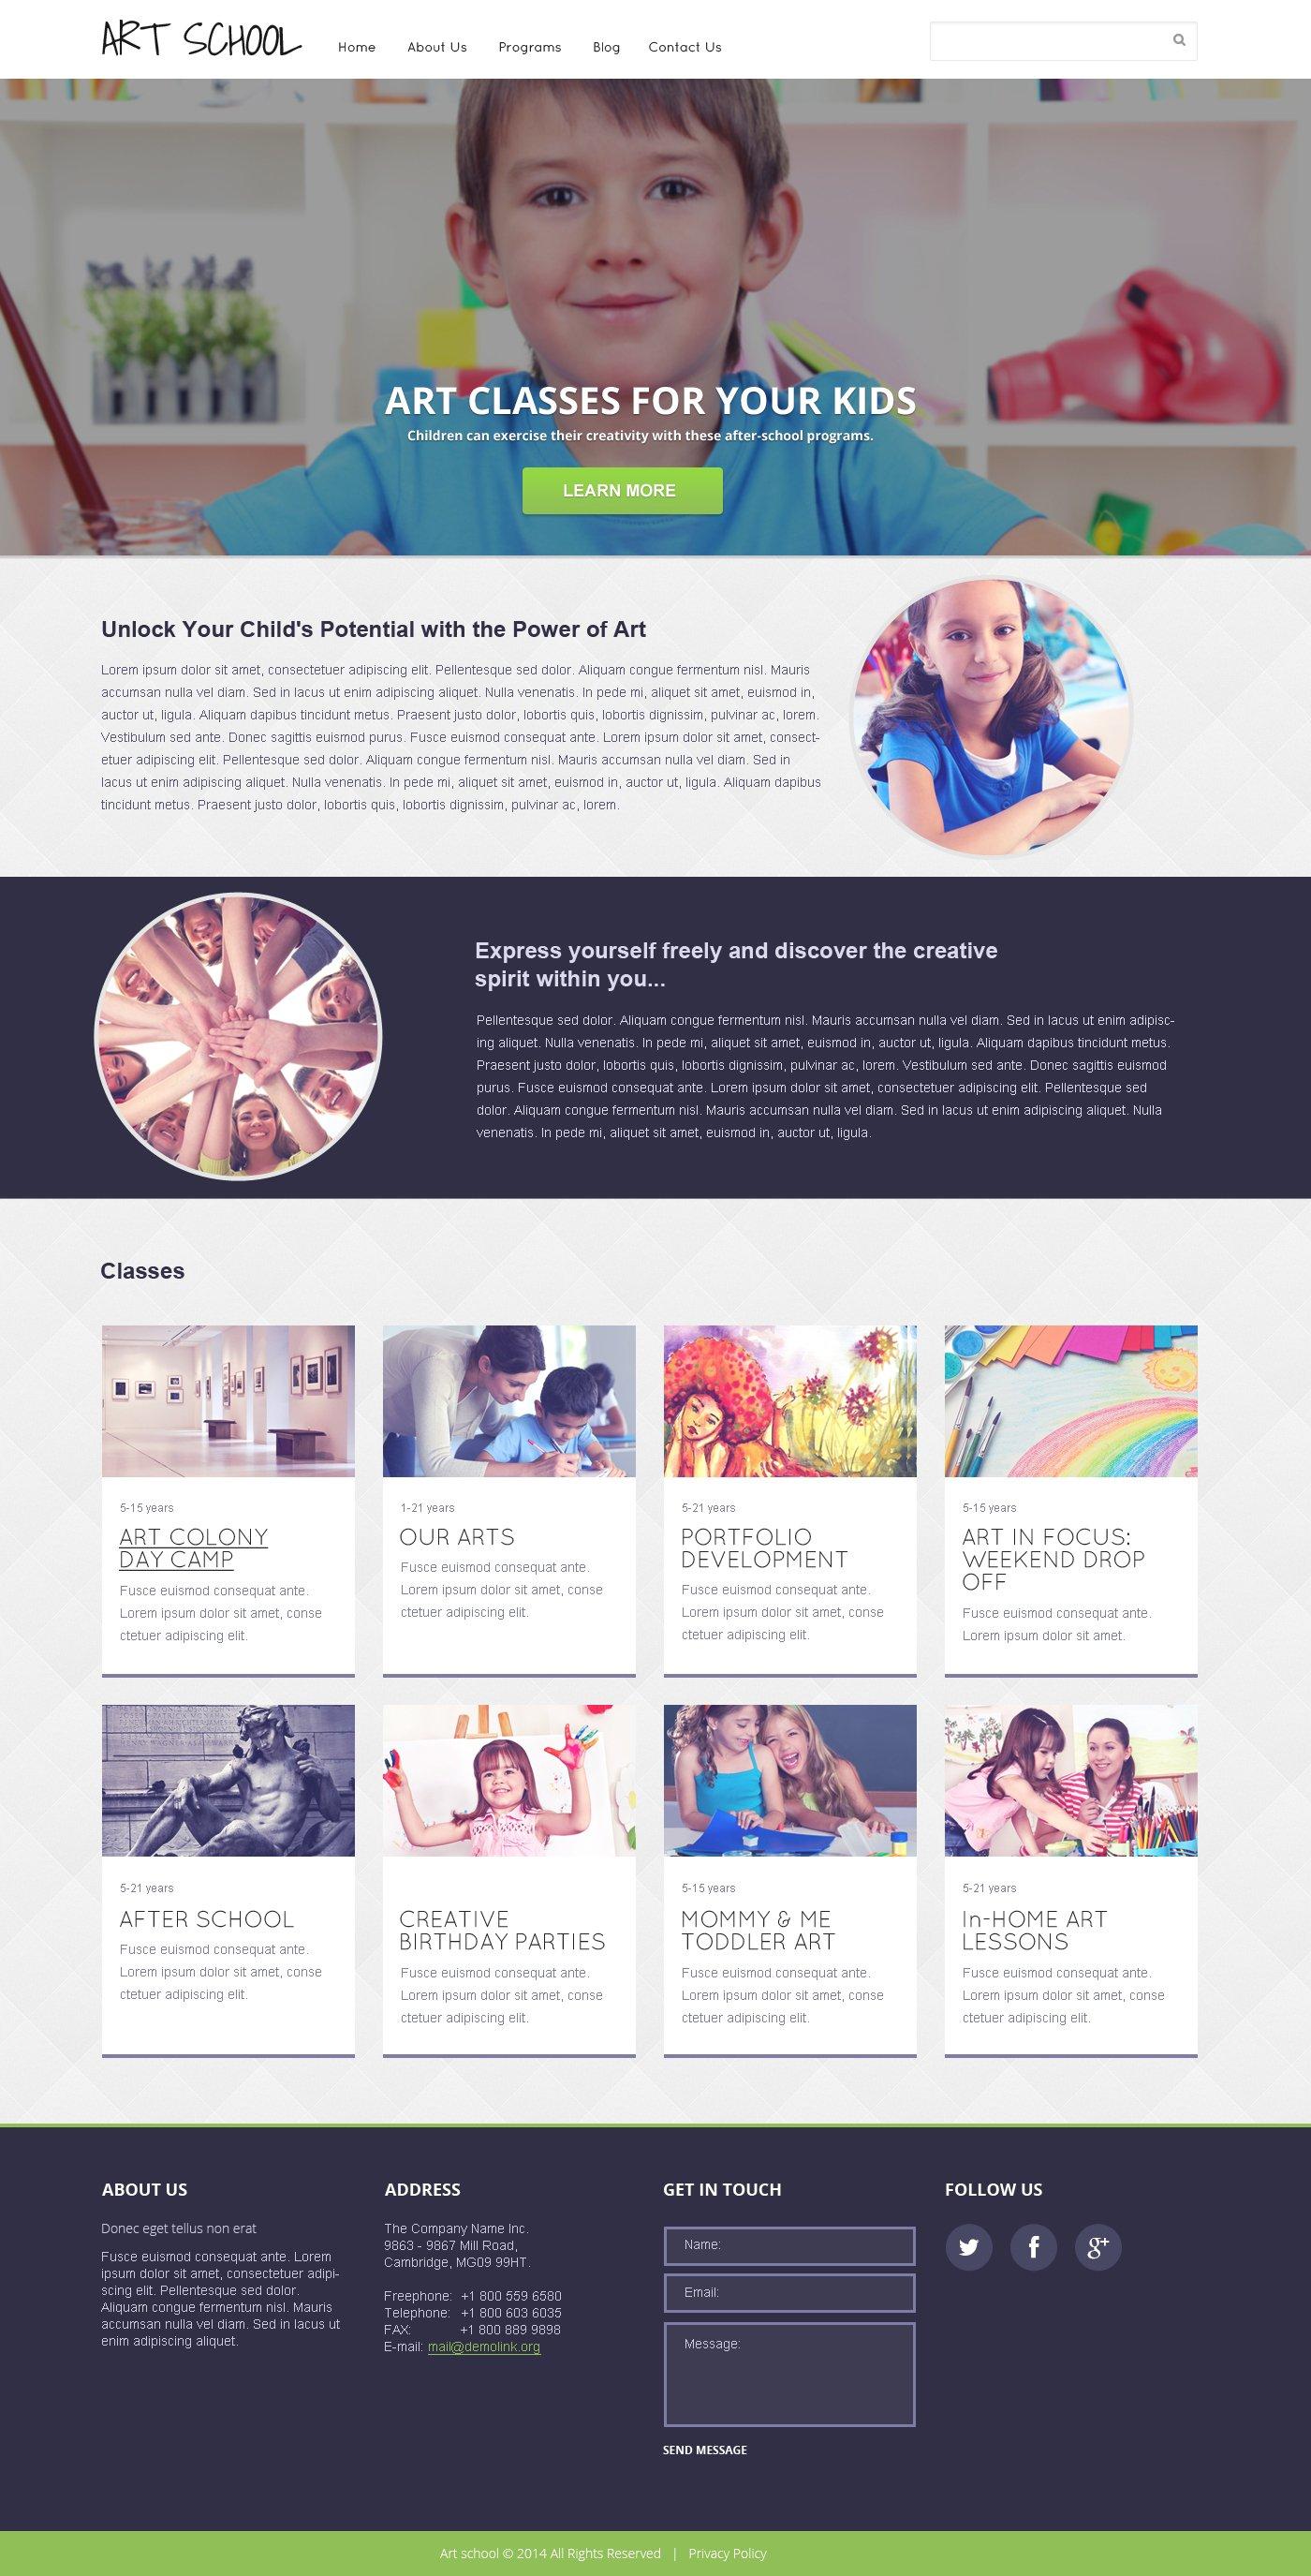 Plantilla Web Responsive para Sitio de Escuelas de arte #47644 - captura de pantalla